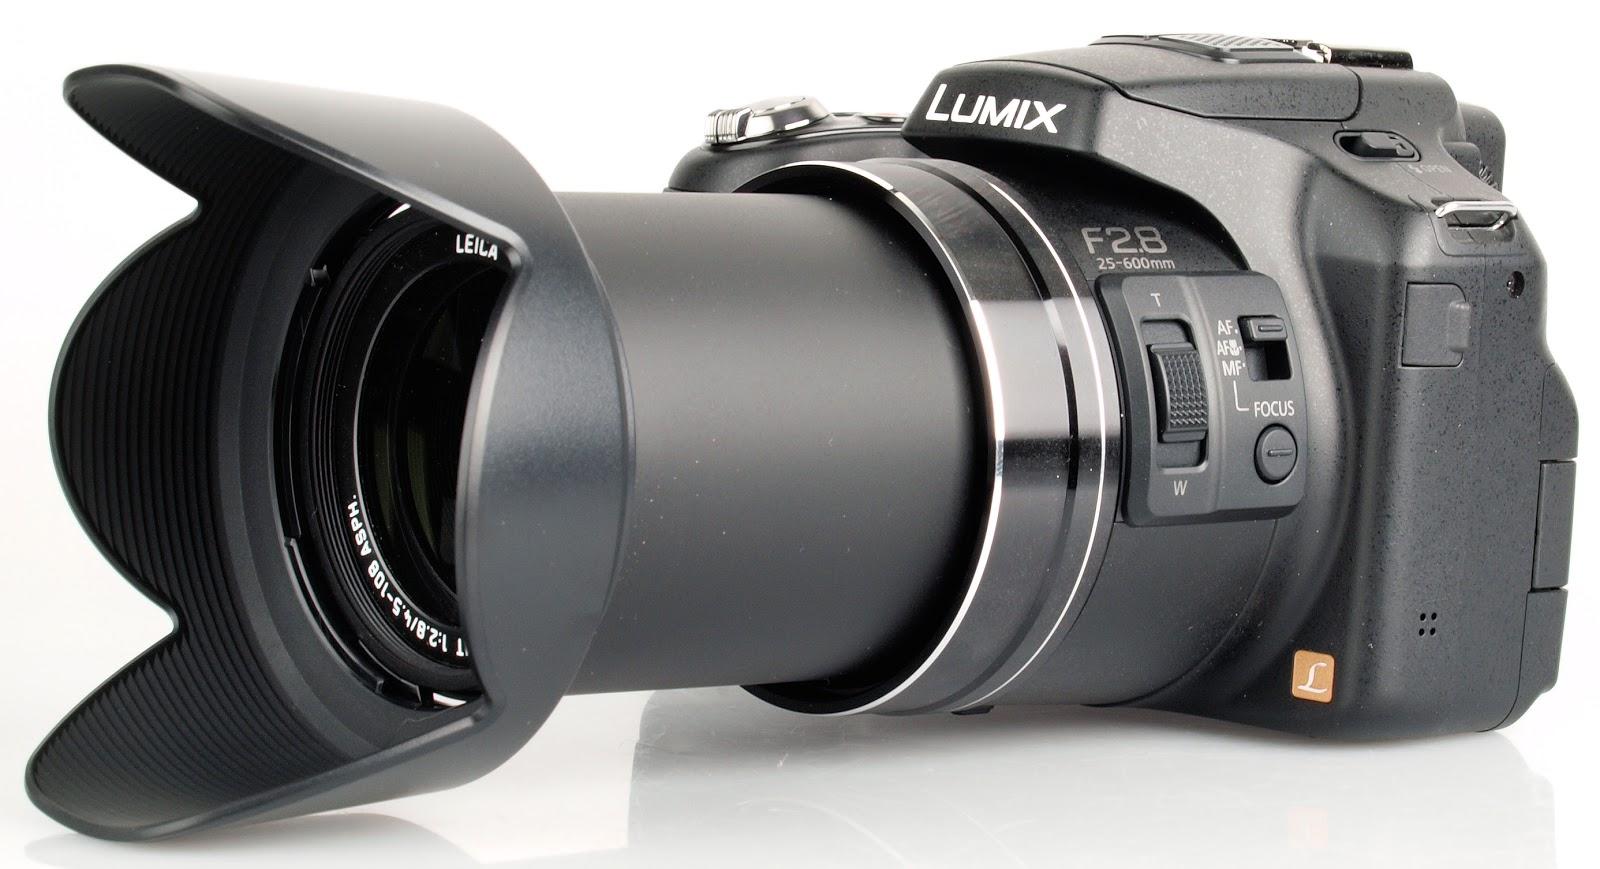 Panasonic Lumix Fz200 Megazoom Camera